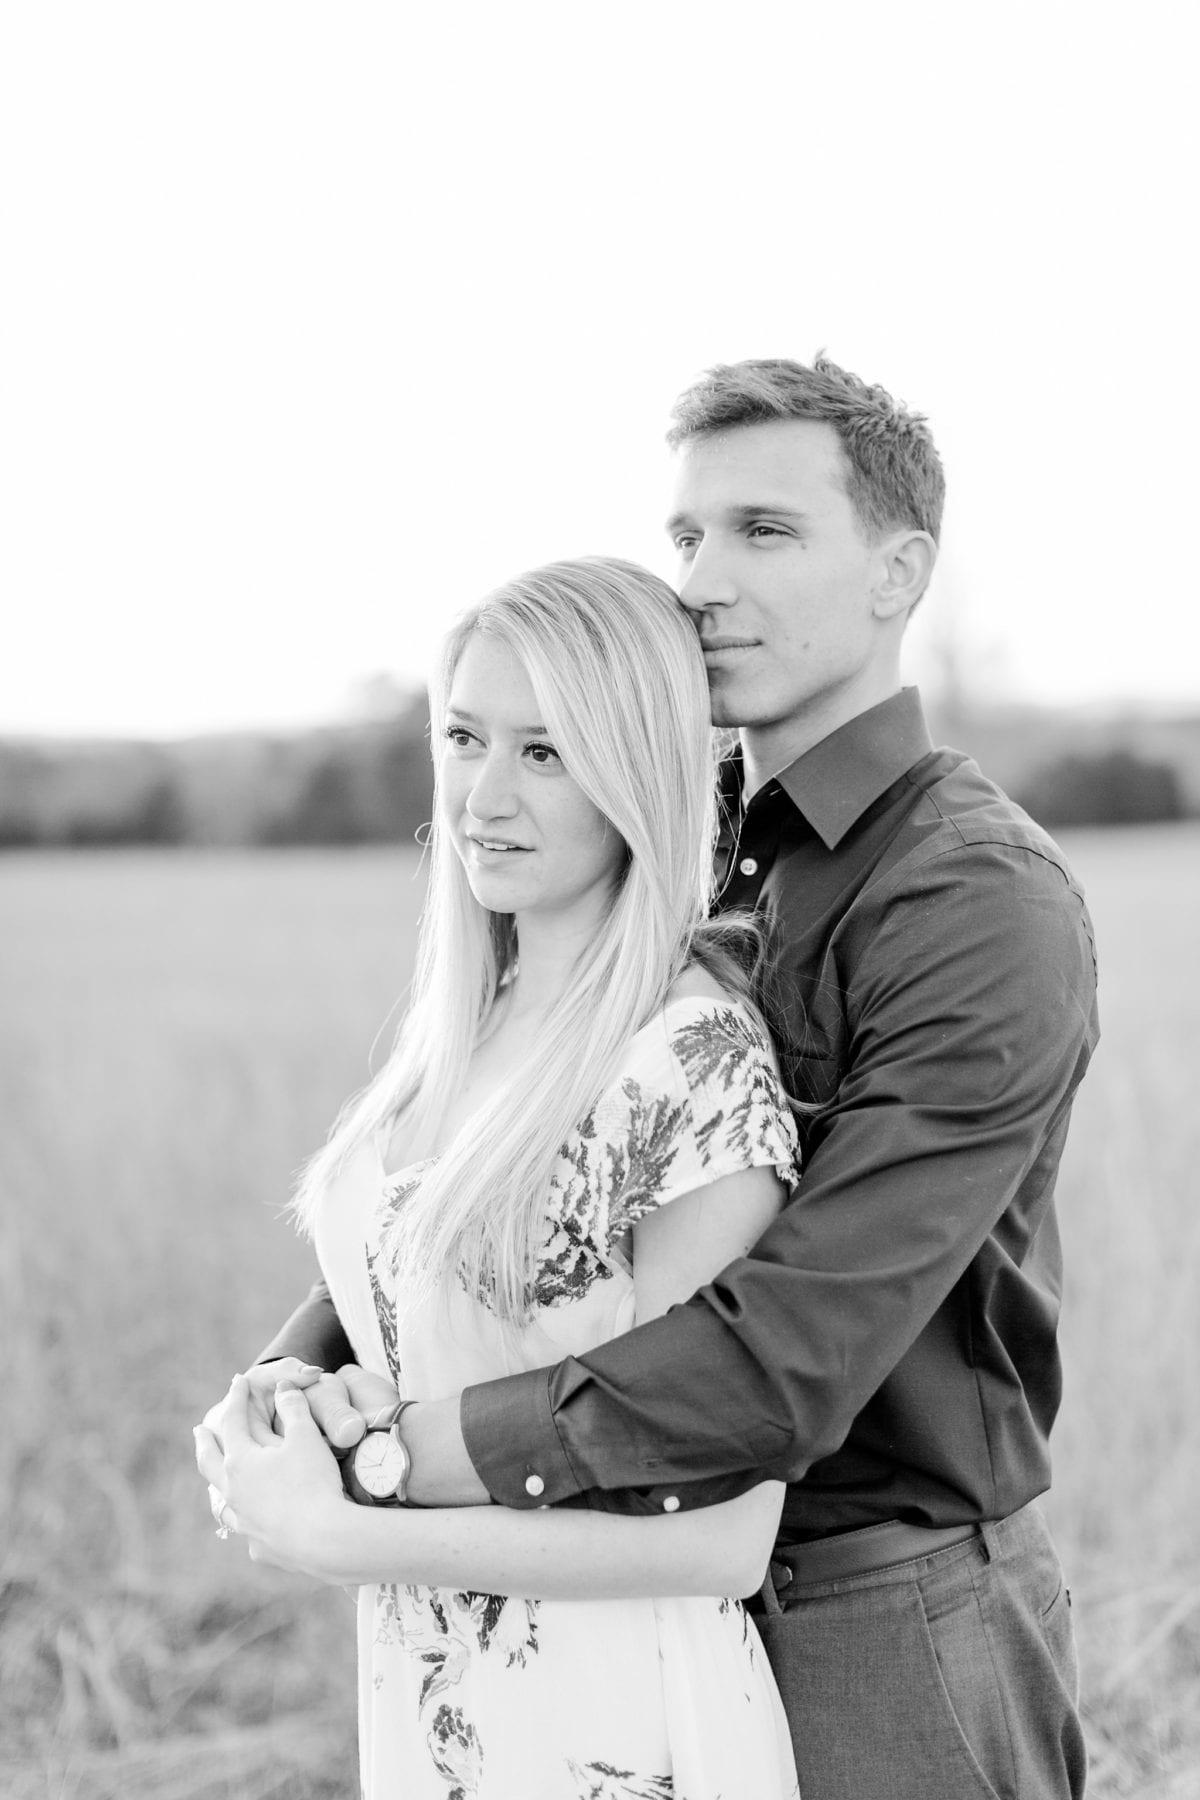 Manassas Battlefield Engagement Session Virginia Wedding Photographer Danielle & Charlie Megan Kelsey Photography-6239-2.jpg